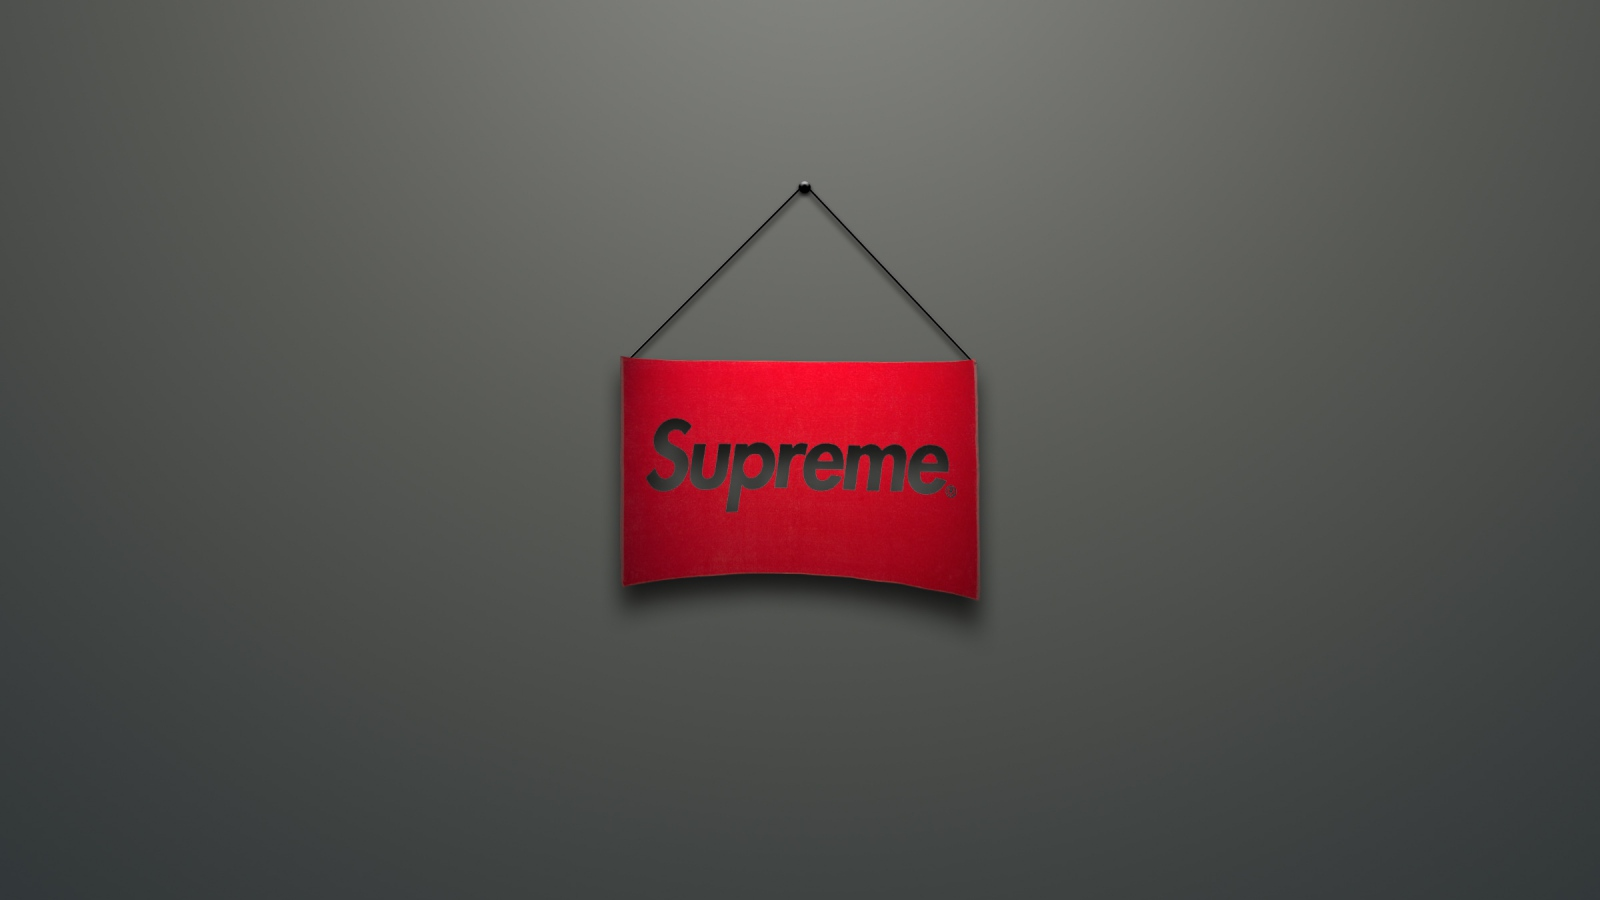 2k Dope Backgrounds